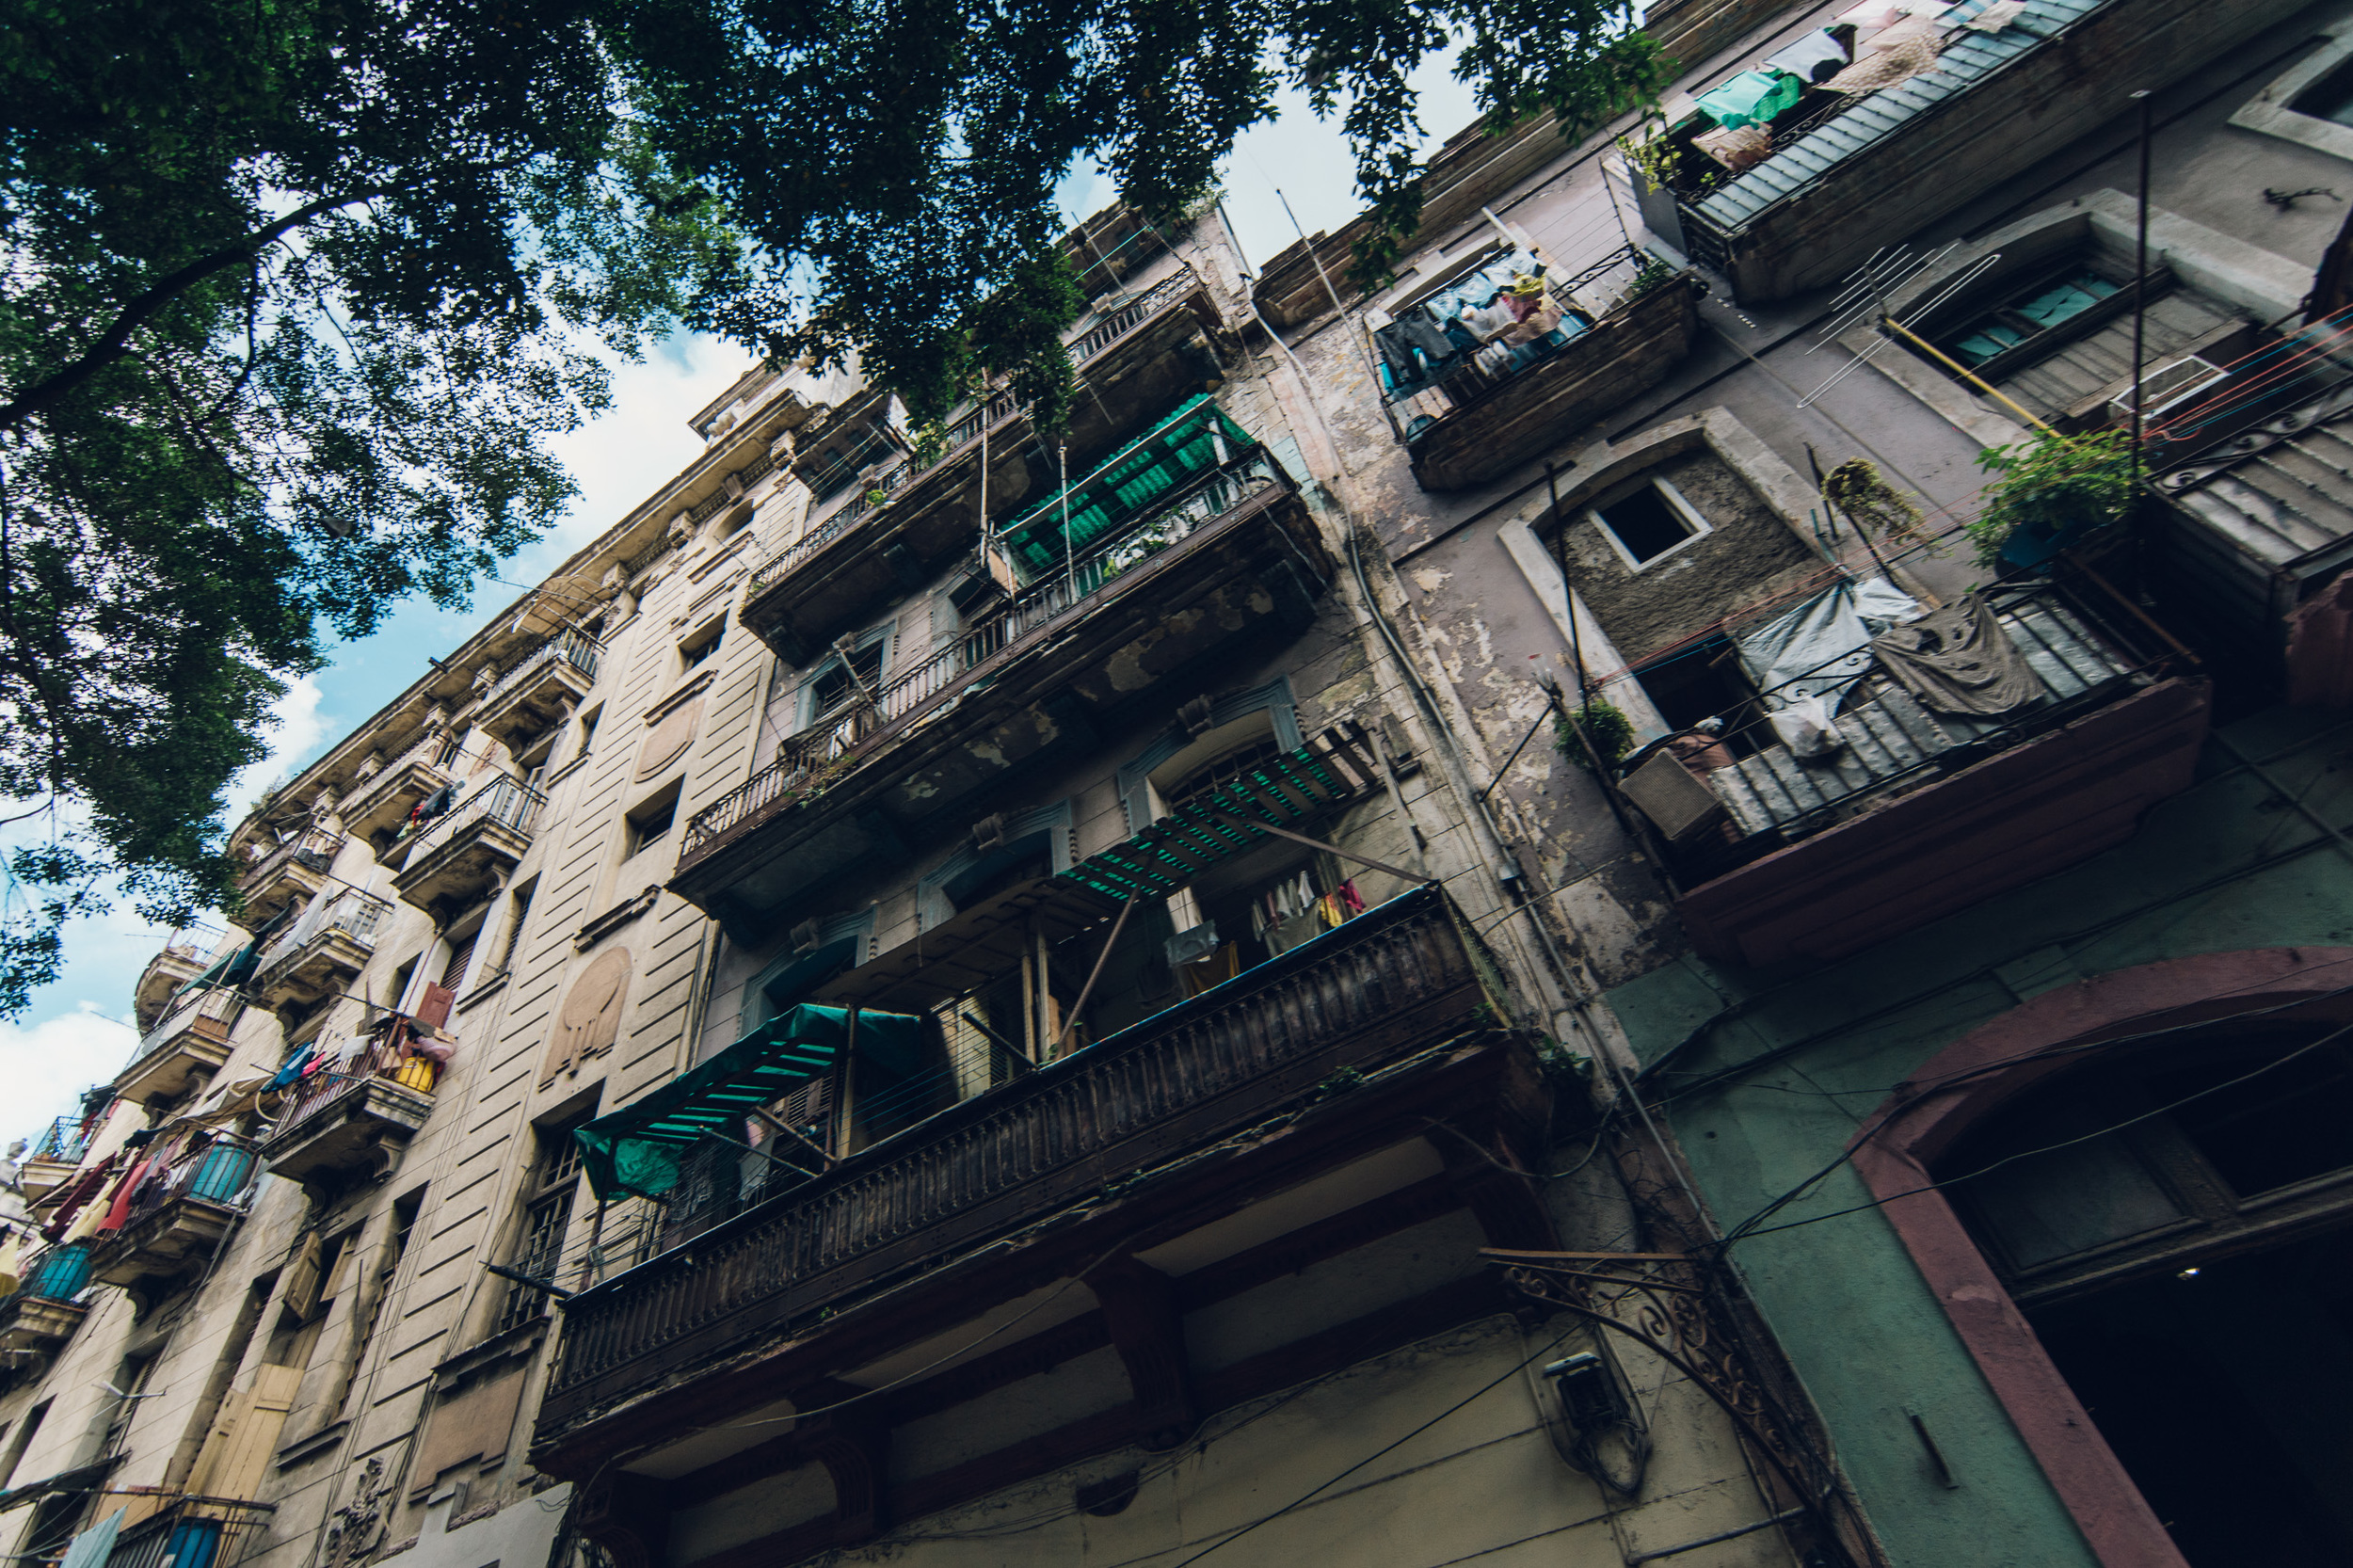 DeClaro-Photography-Cuba-02488.jpg